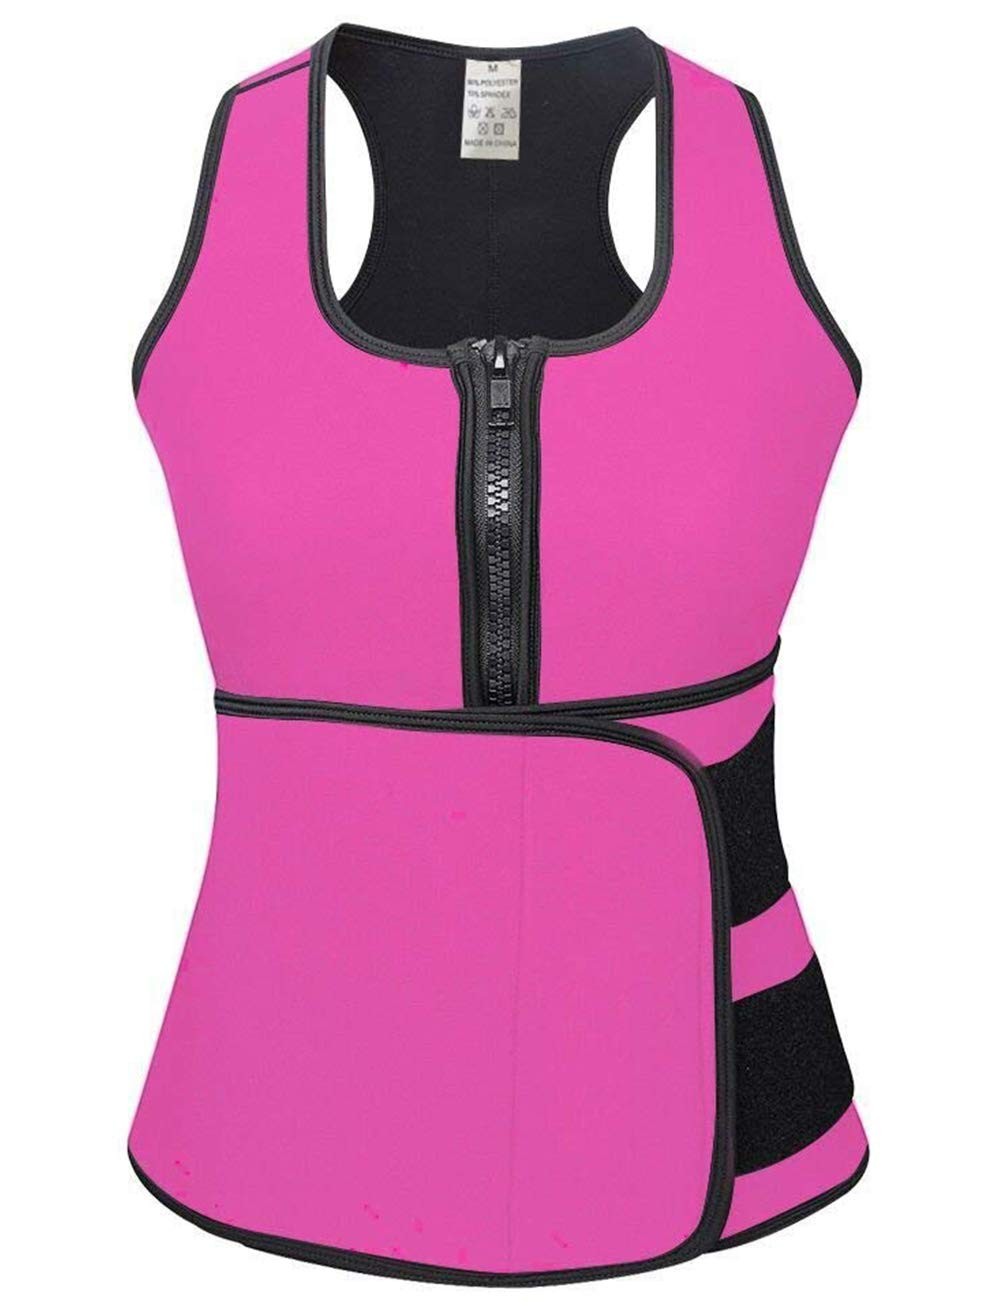 (Large, Pink) - HEXIN Neoprene Sauna Waist Trainer Weight Loss Shapewear With Adjustable Waist Trimmer Belt S-4Xl Size   B07CWQ69R5